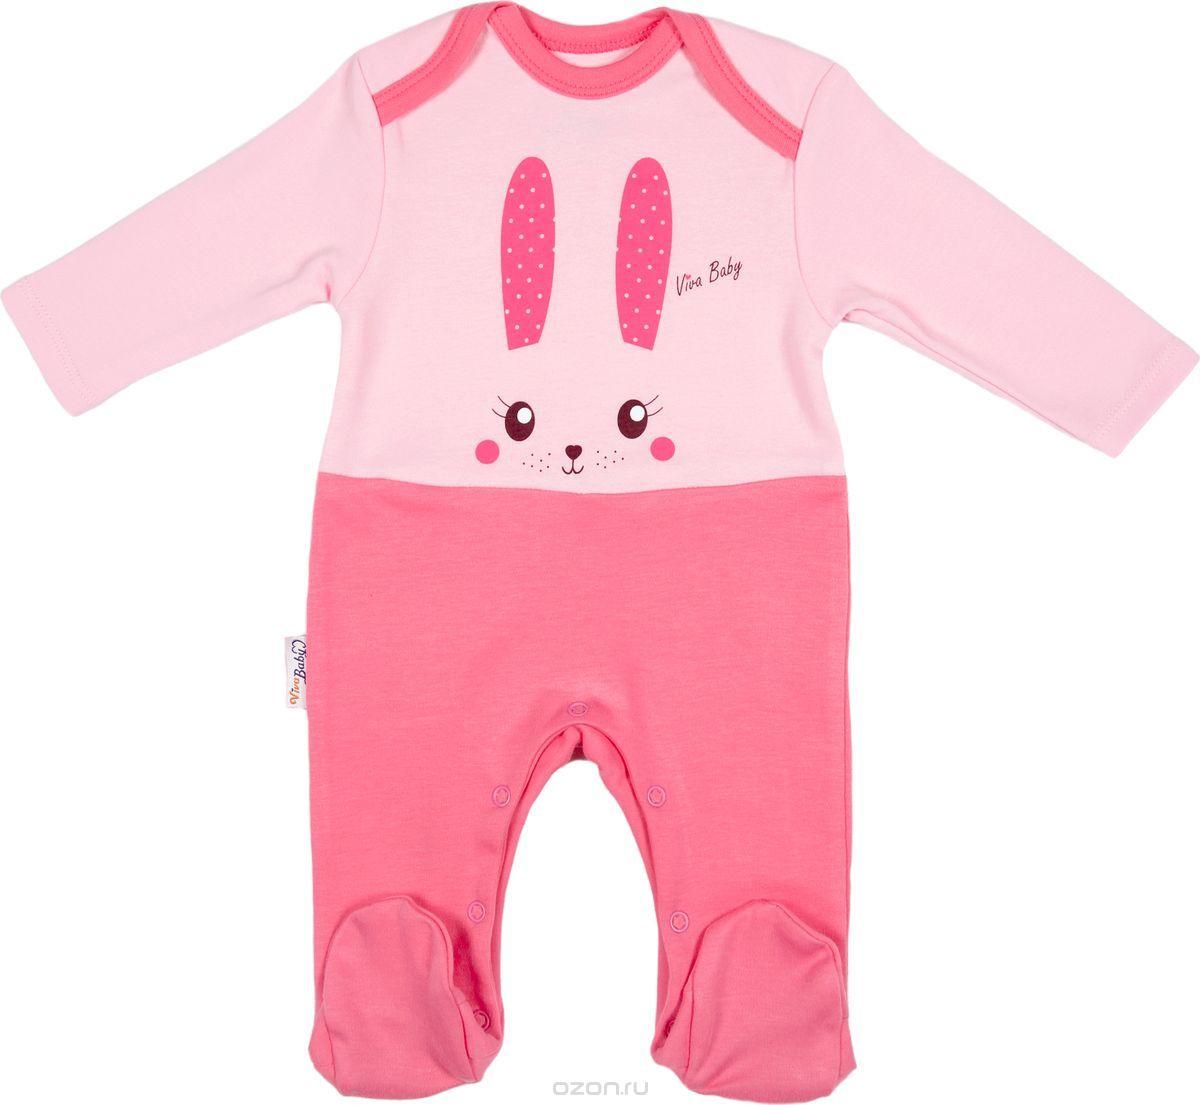 Комбинезон домашний Viva Baby комбинезон домашний для новорожденных viva baby цвет розовый d2301 2 размер 62